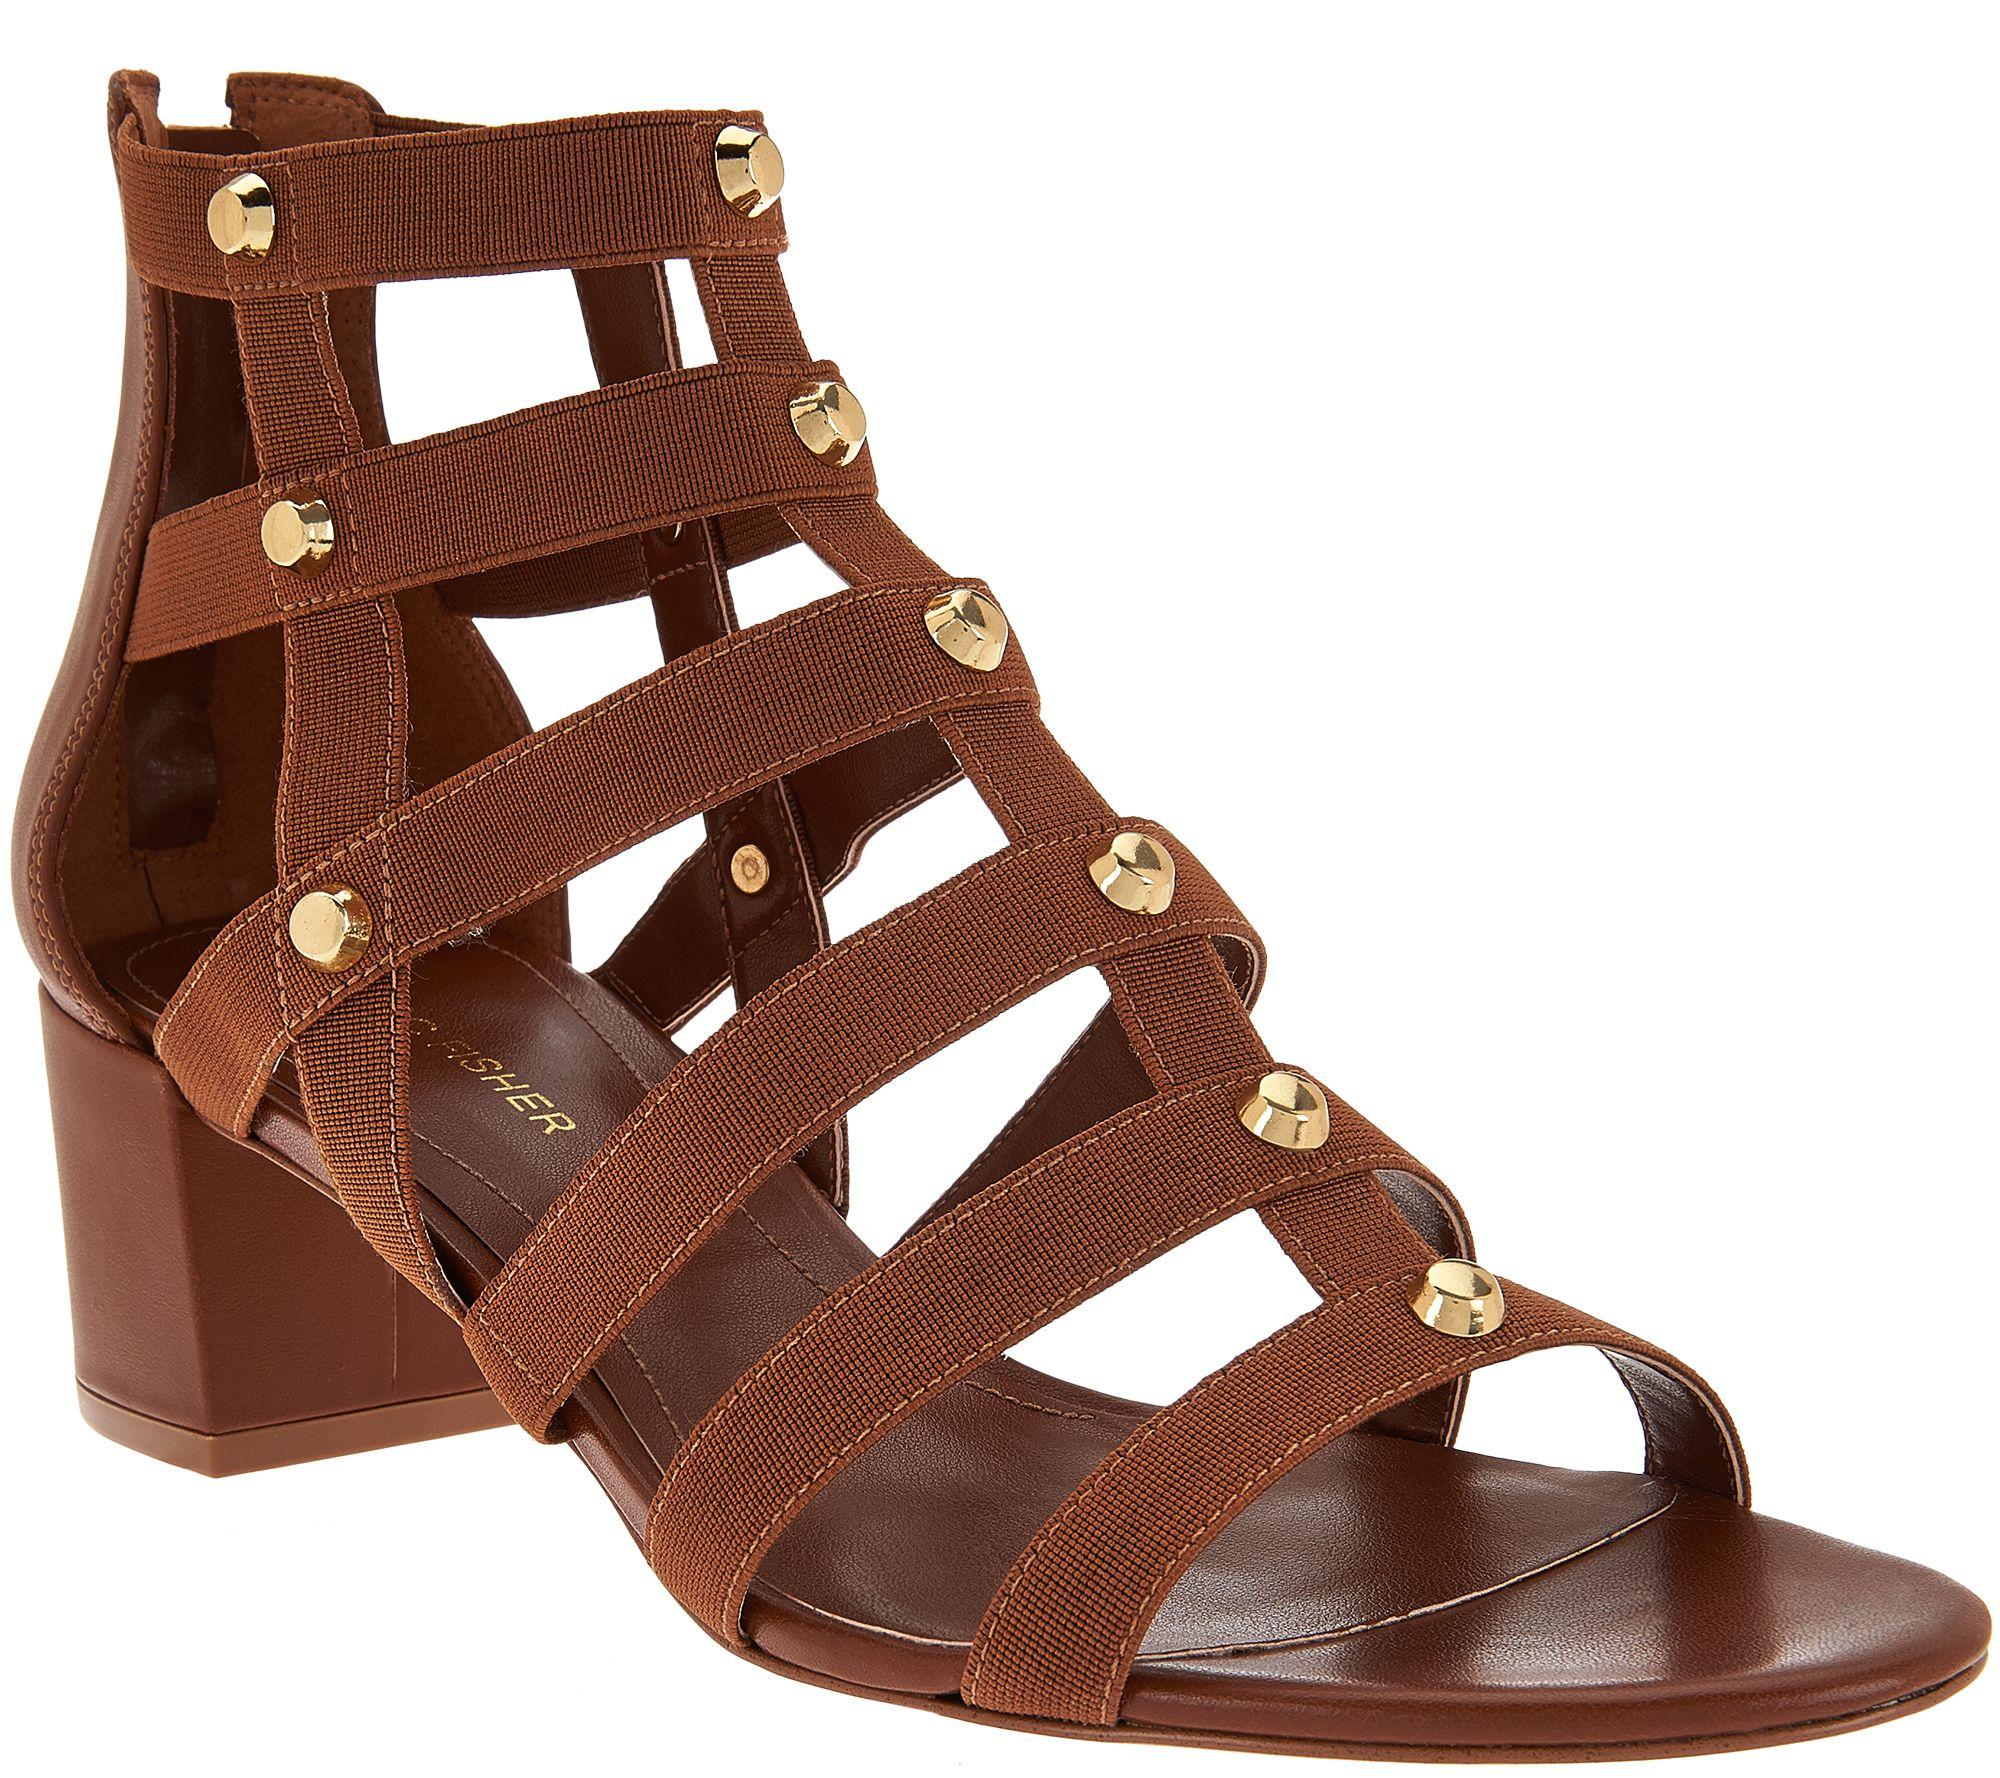 5e868b37ba5b Marc Fisher Gladiator Block Heel Sandals - Julee - Page 1 — QVC.com